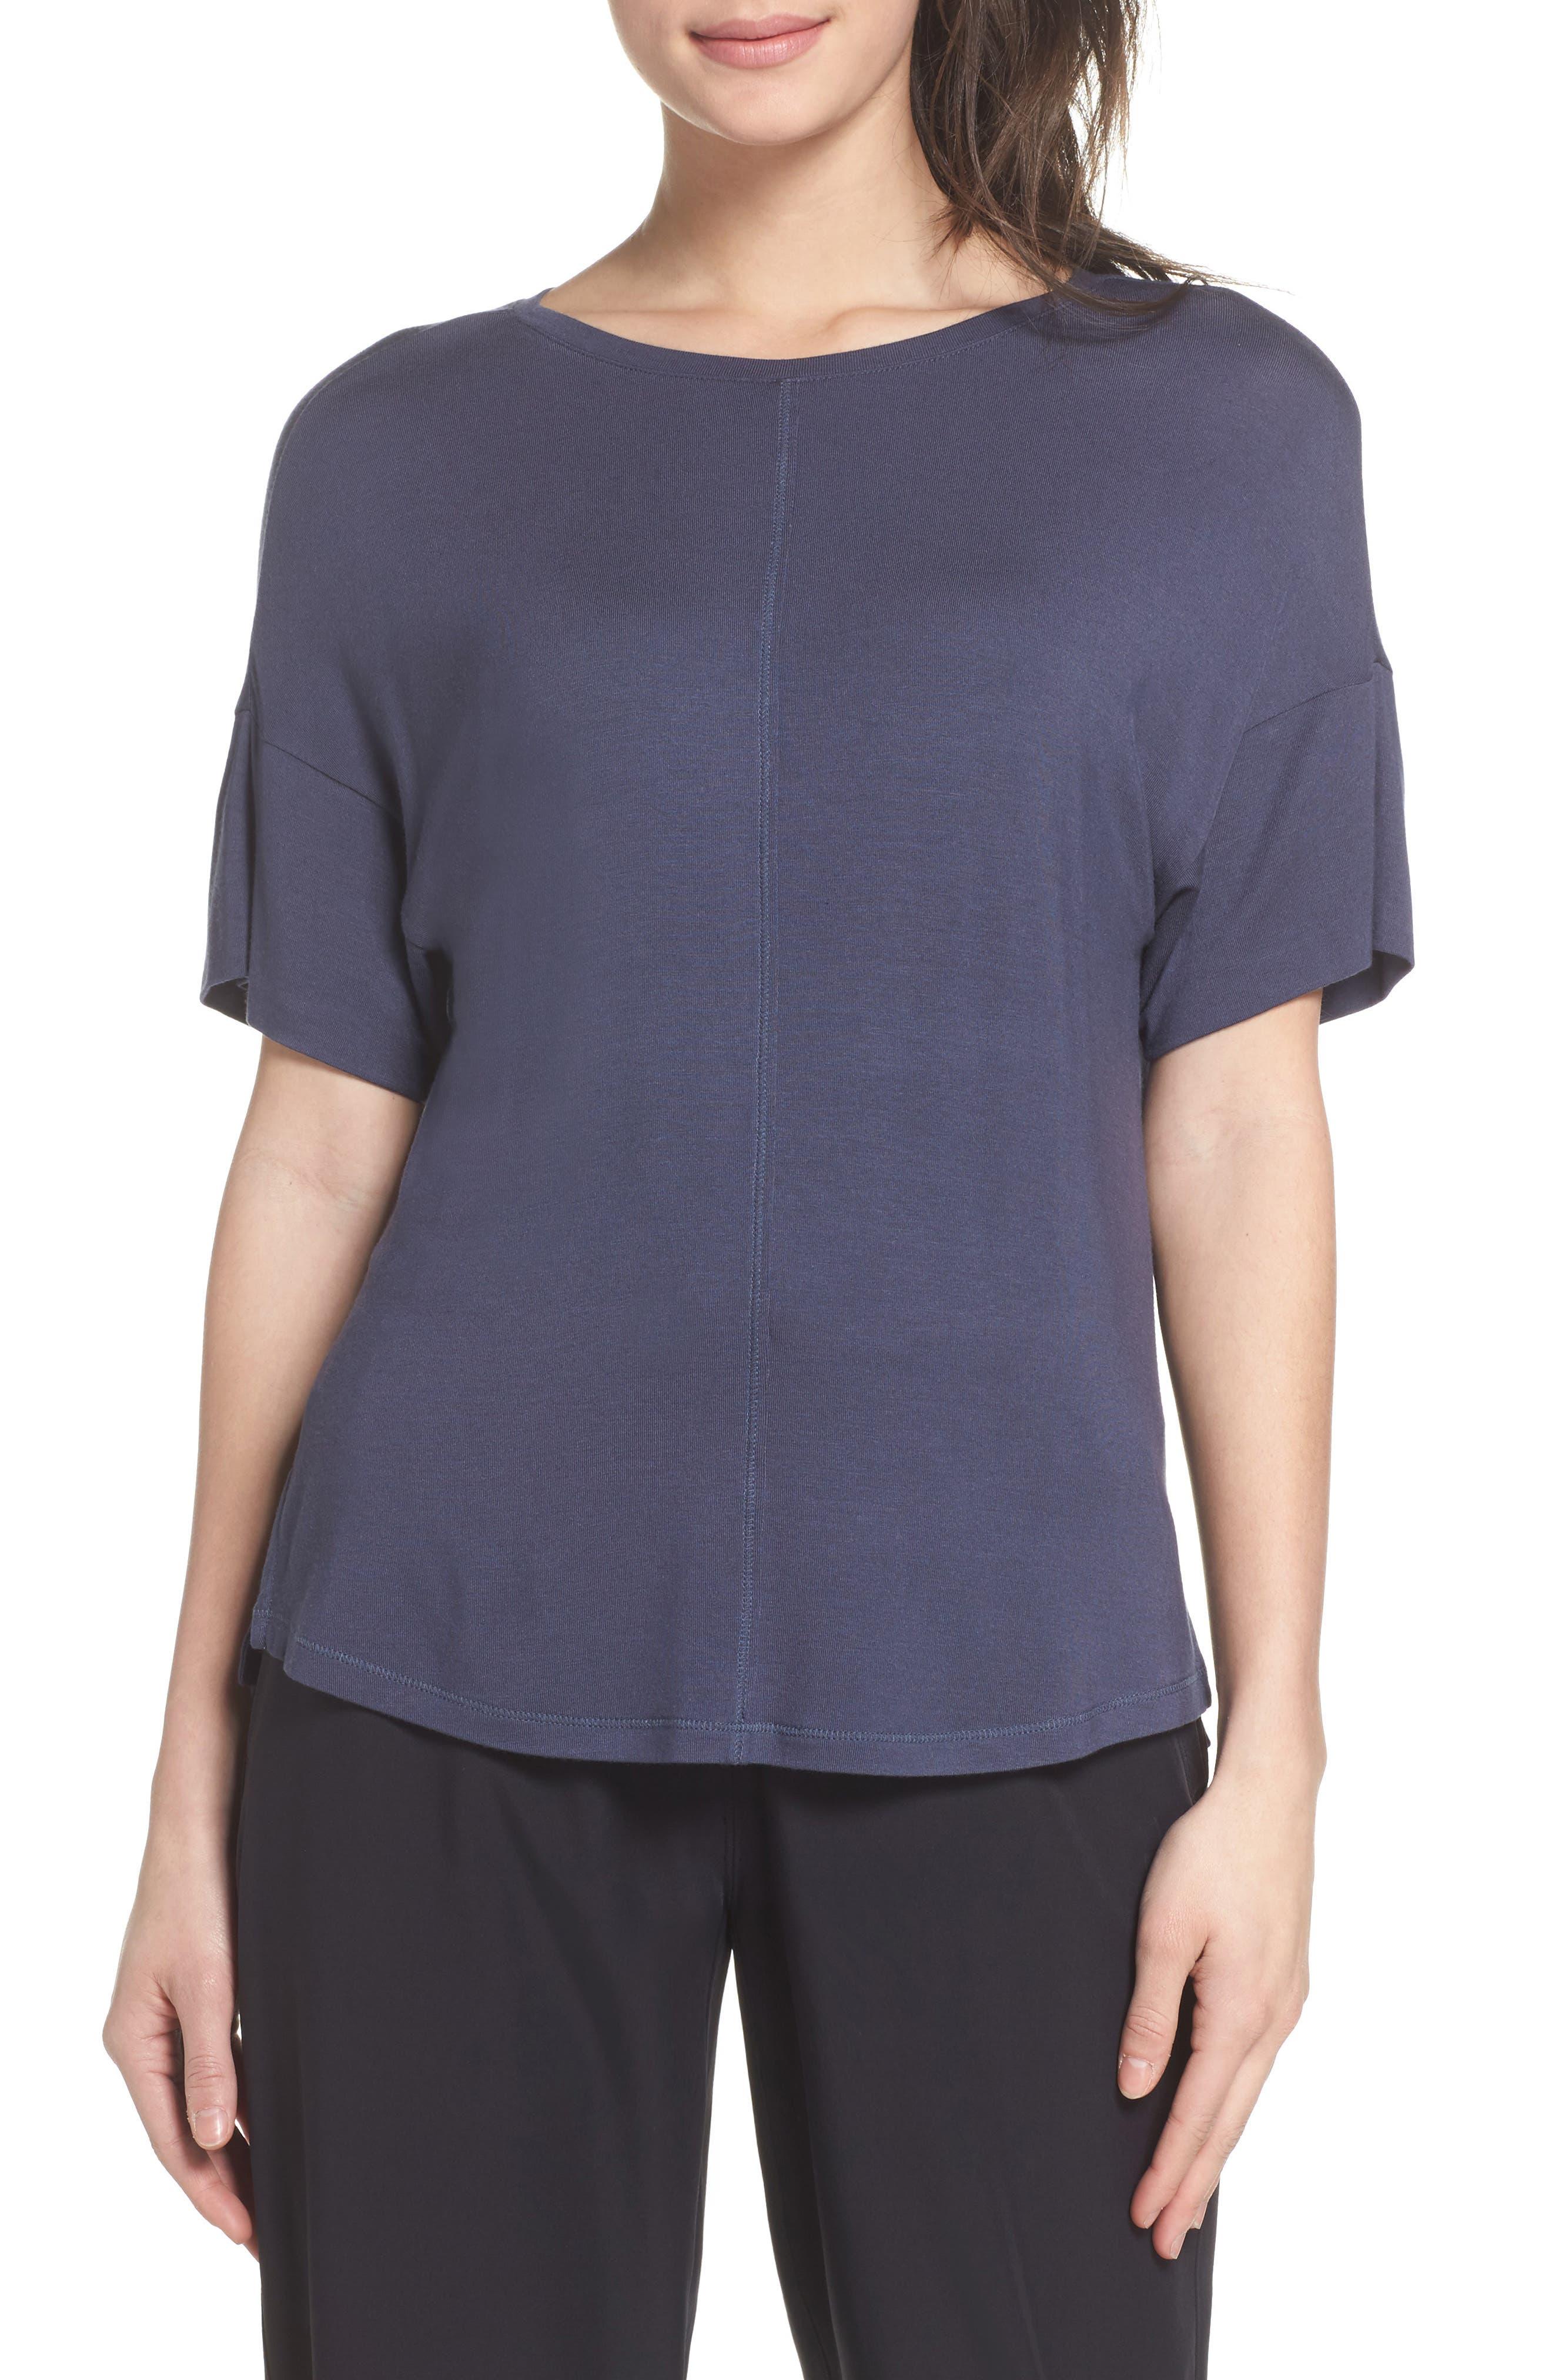 ZELLA New Energy T-Shirt, Main, color, GREY SLATE